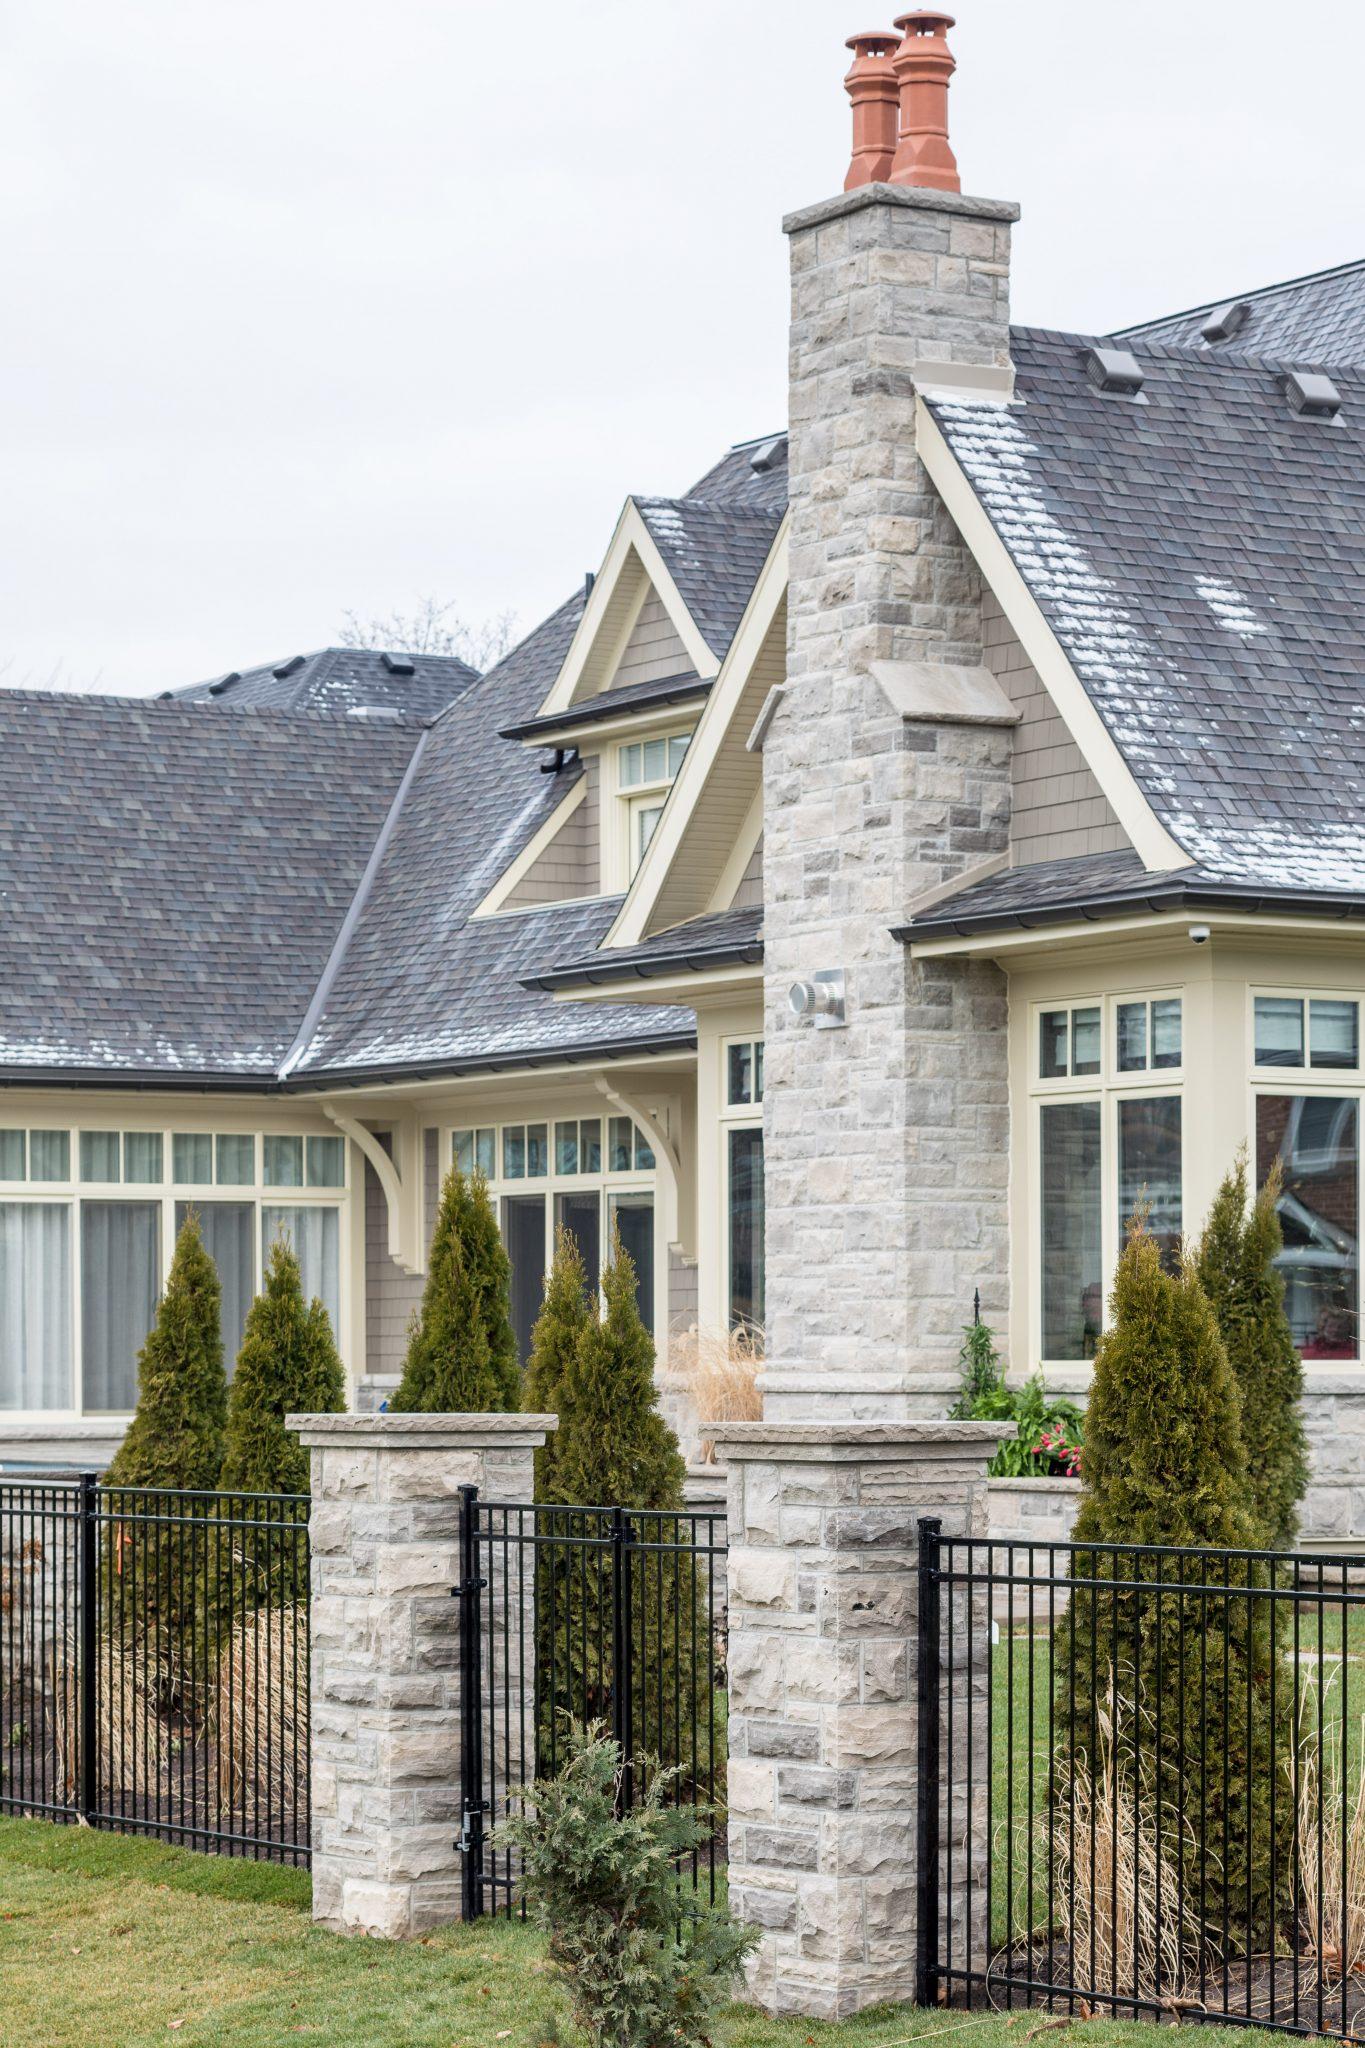 Home by Neven Custom Homes Ltd.